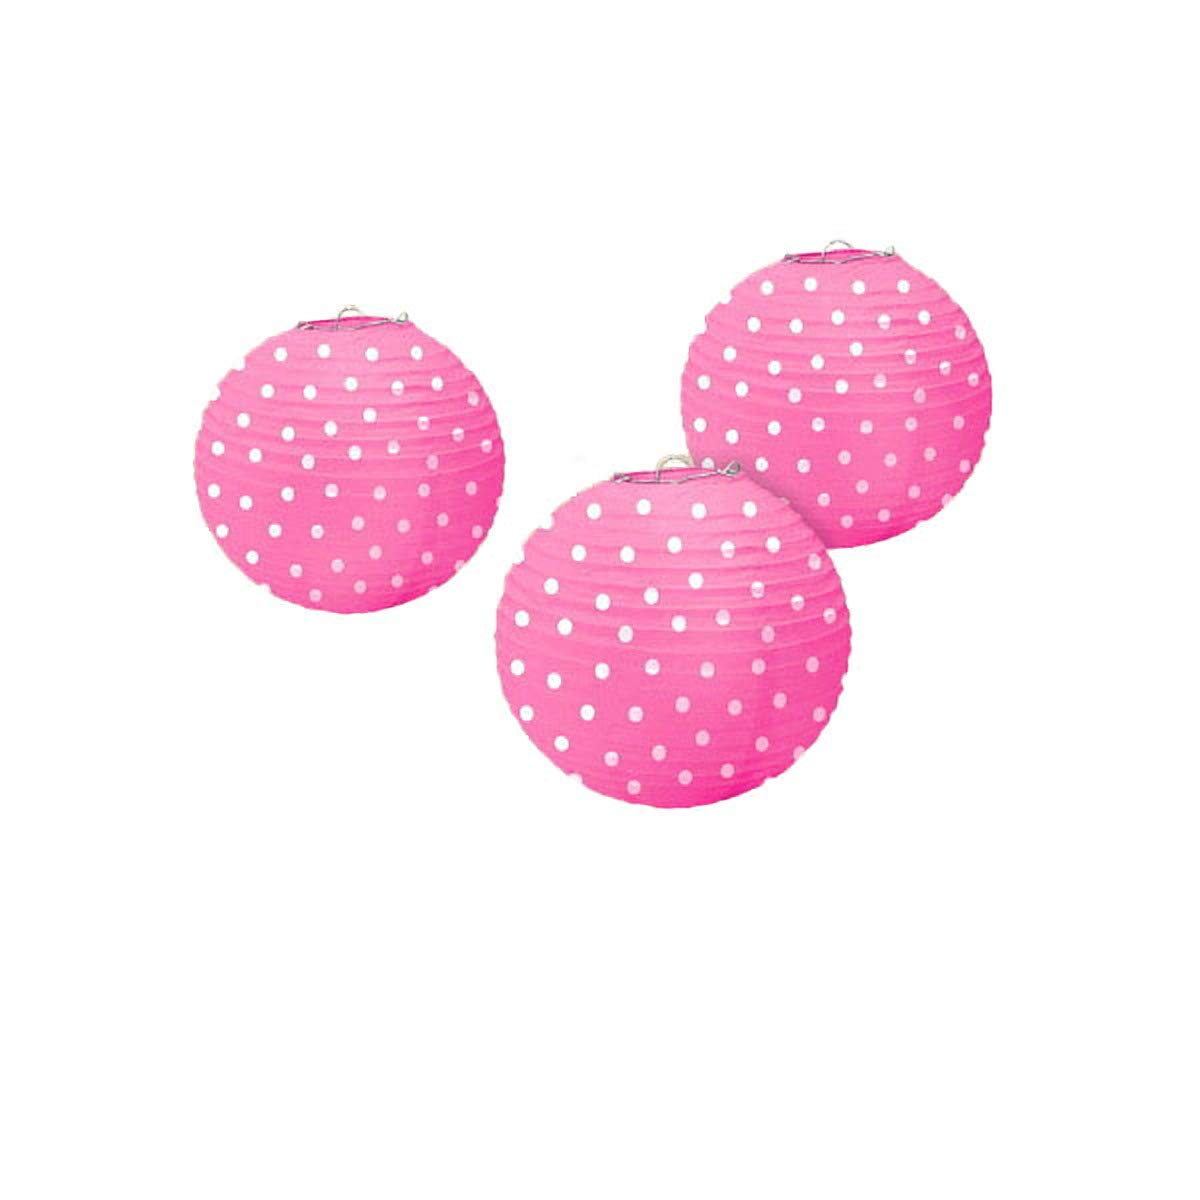 Dots Printed Paper Lanterns - Bright Pink, 36 Ct.